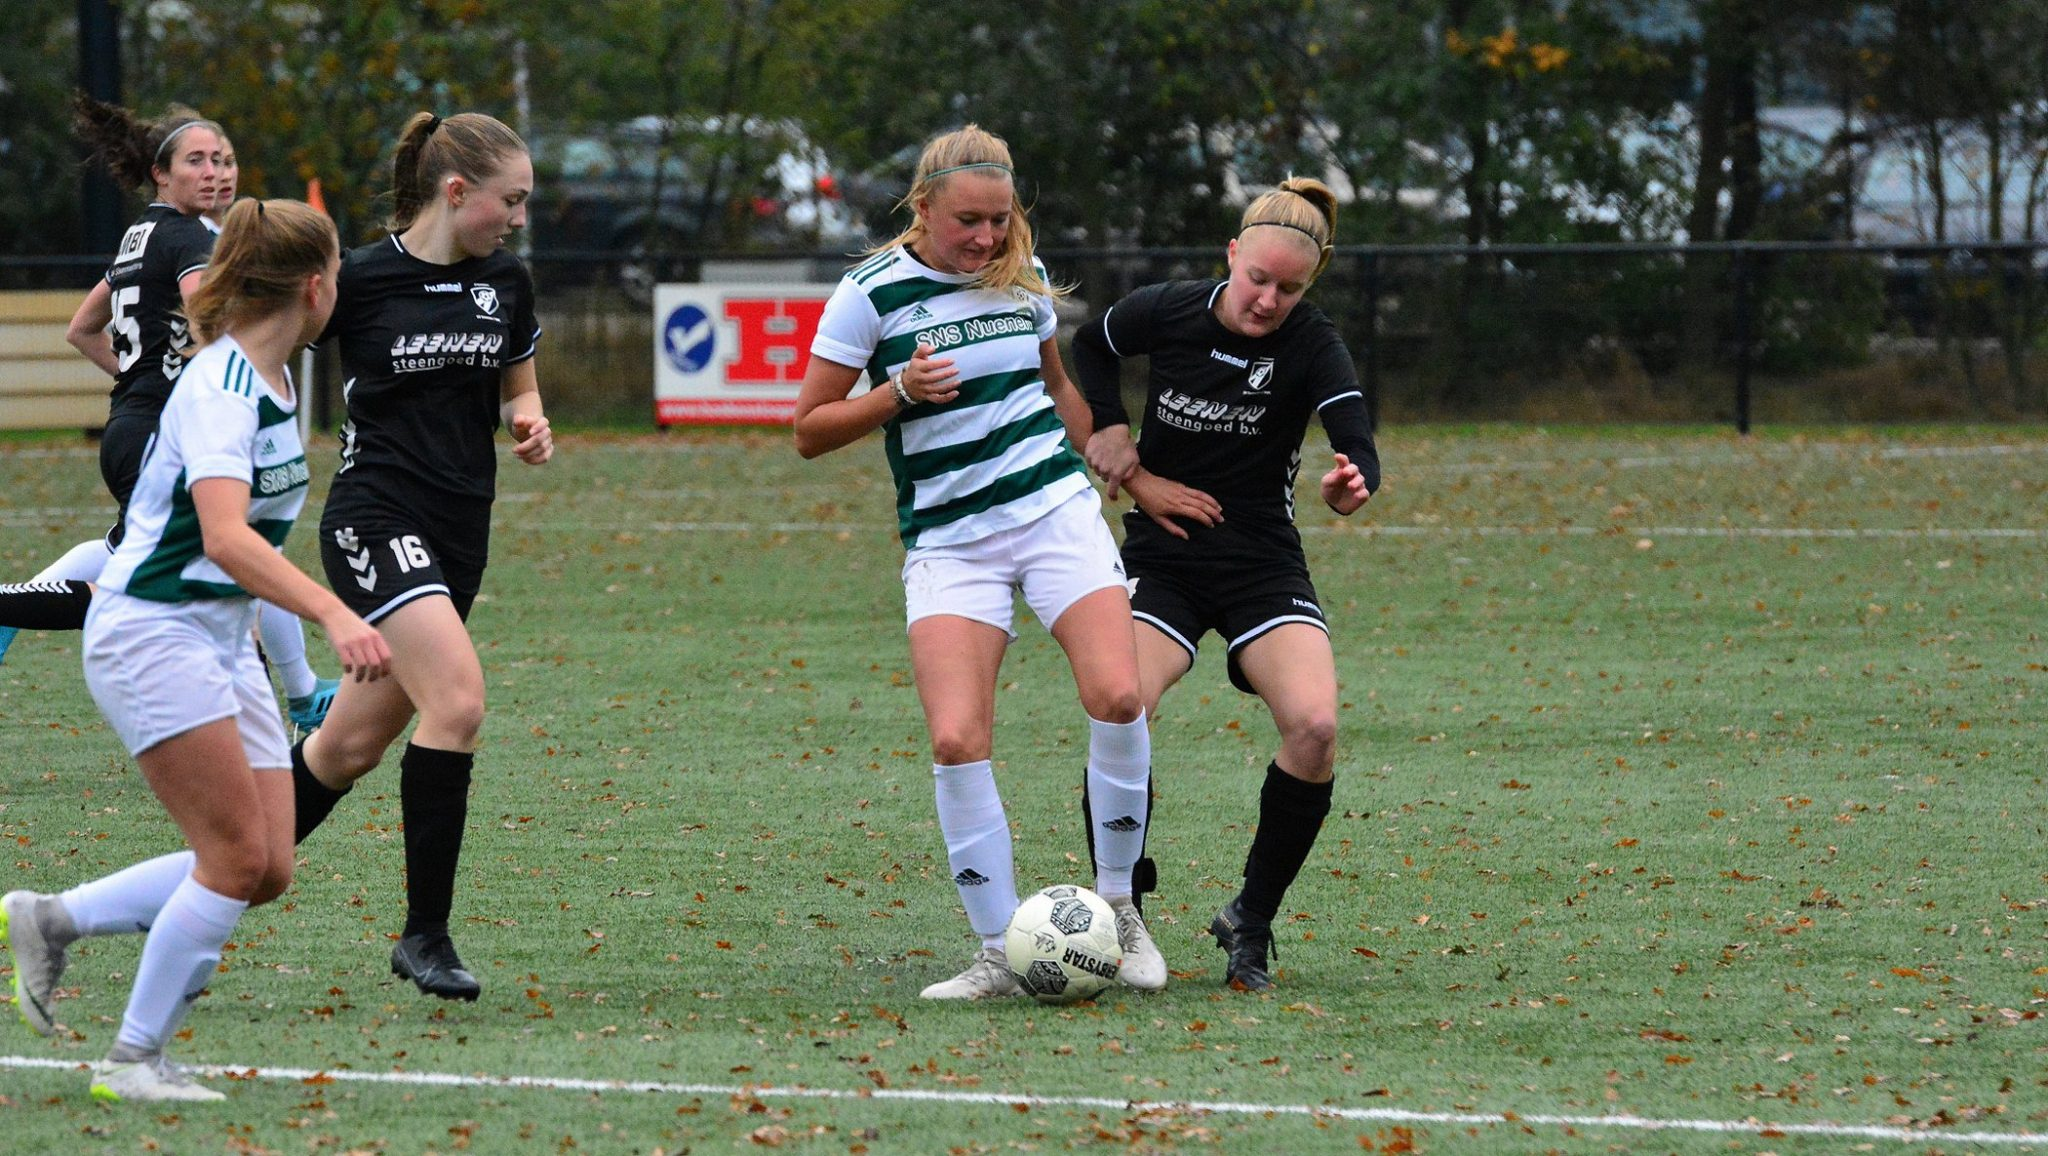 Someren/NWC wint in de slotfase de derby tegen RKSV Nuenen